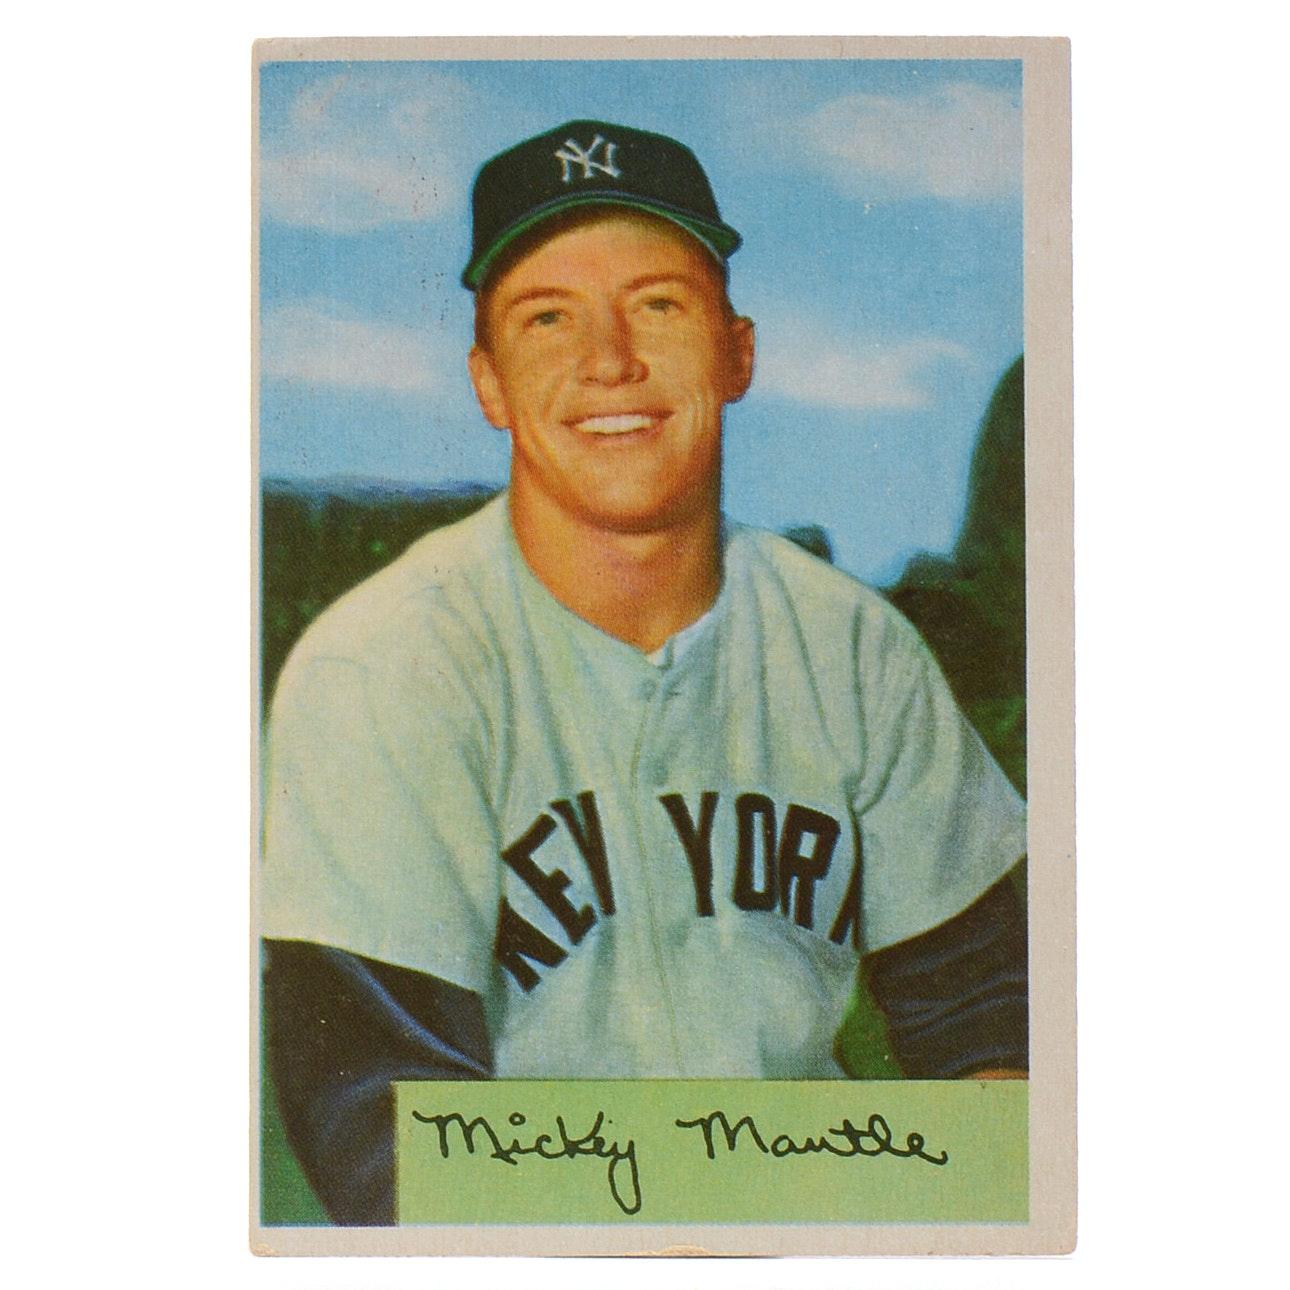 1954 Mickey Mantle New York Yankees Bowman Baseball Card